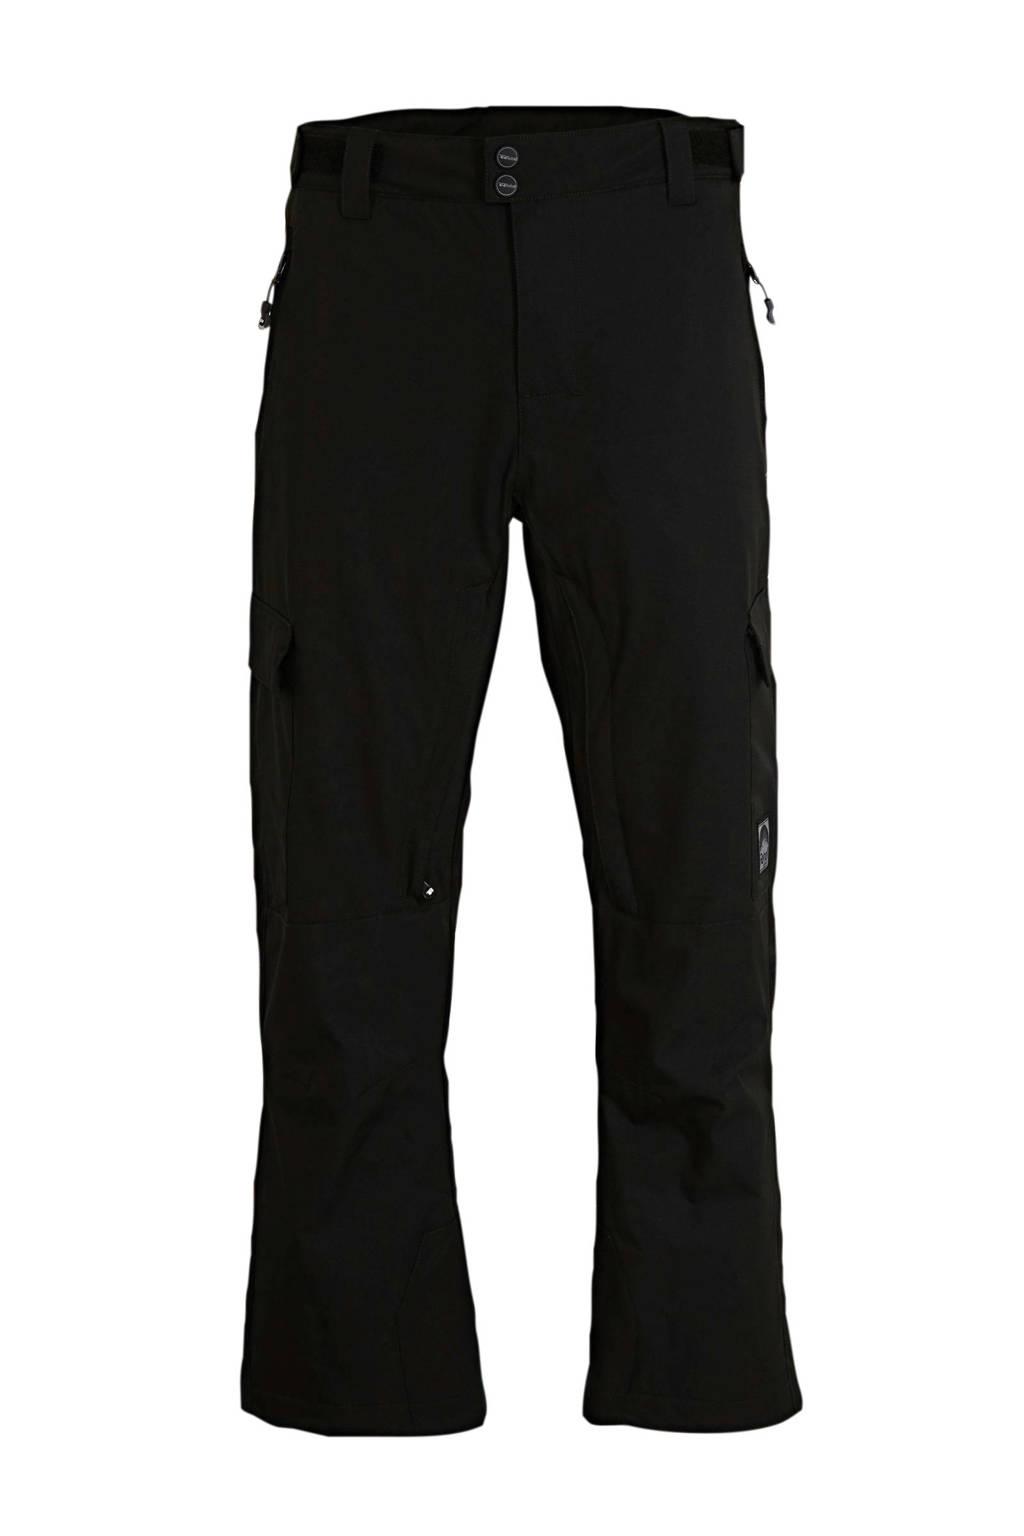 Rehall skibroek Edge-R zwart, Zwart